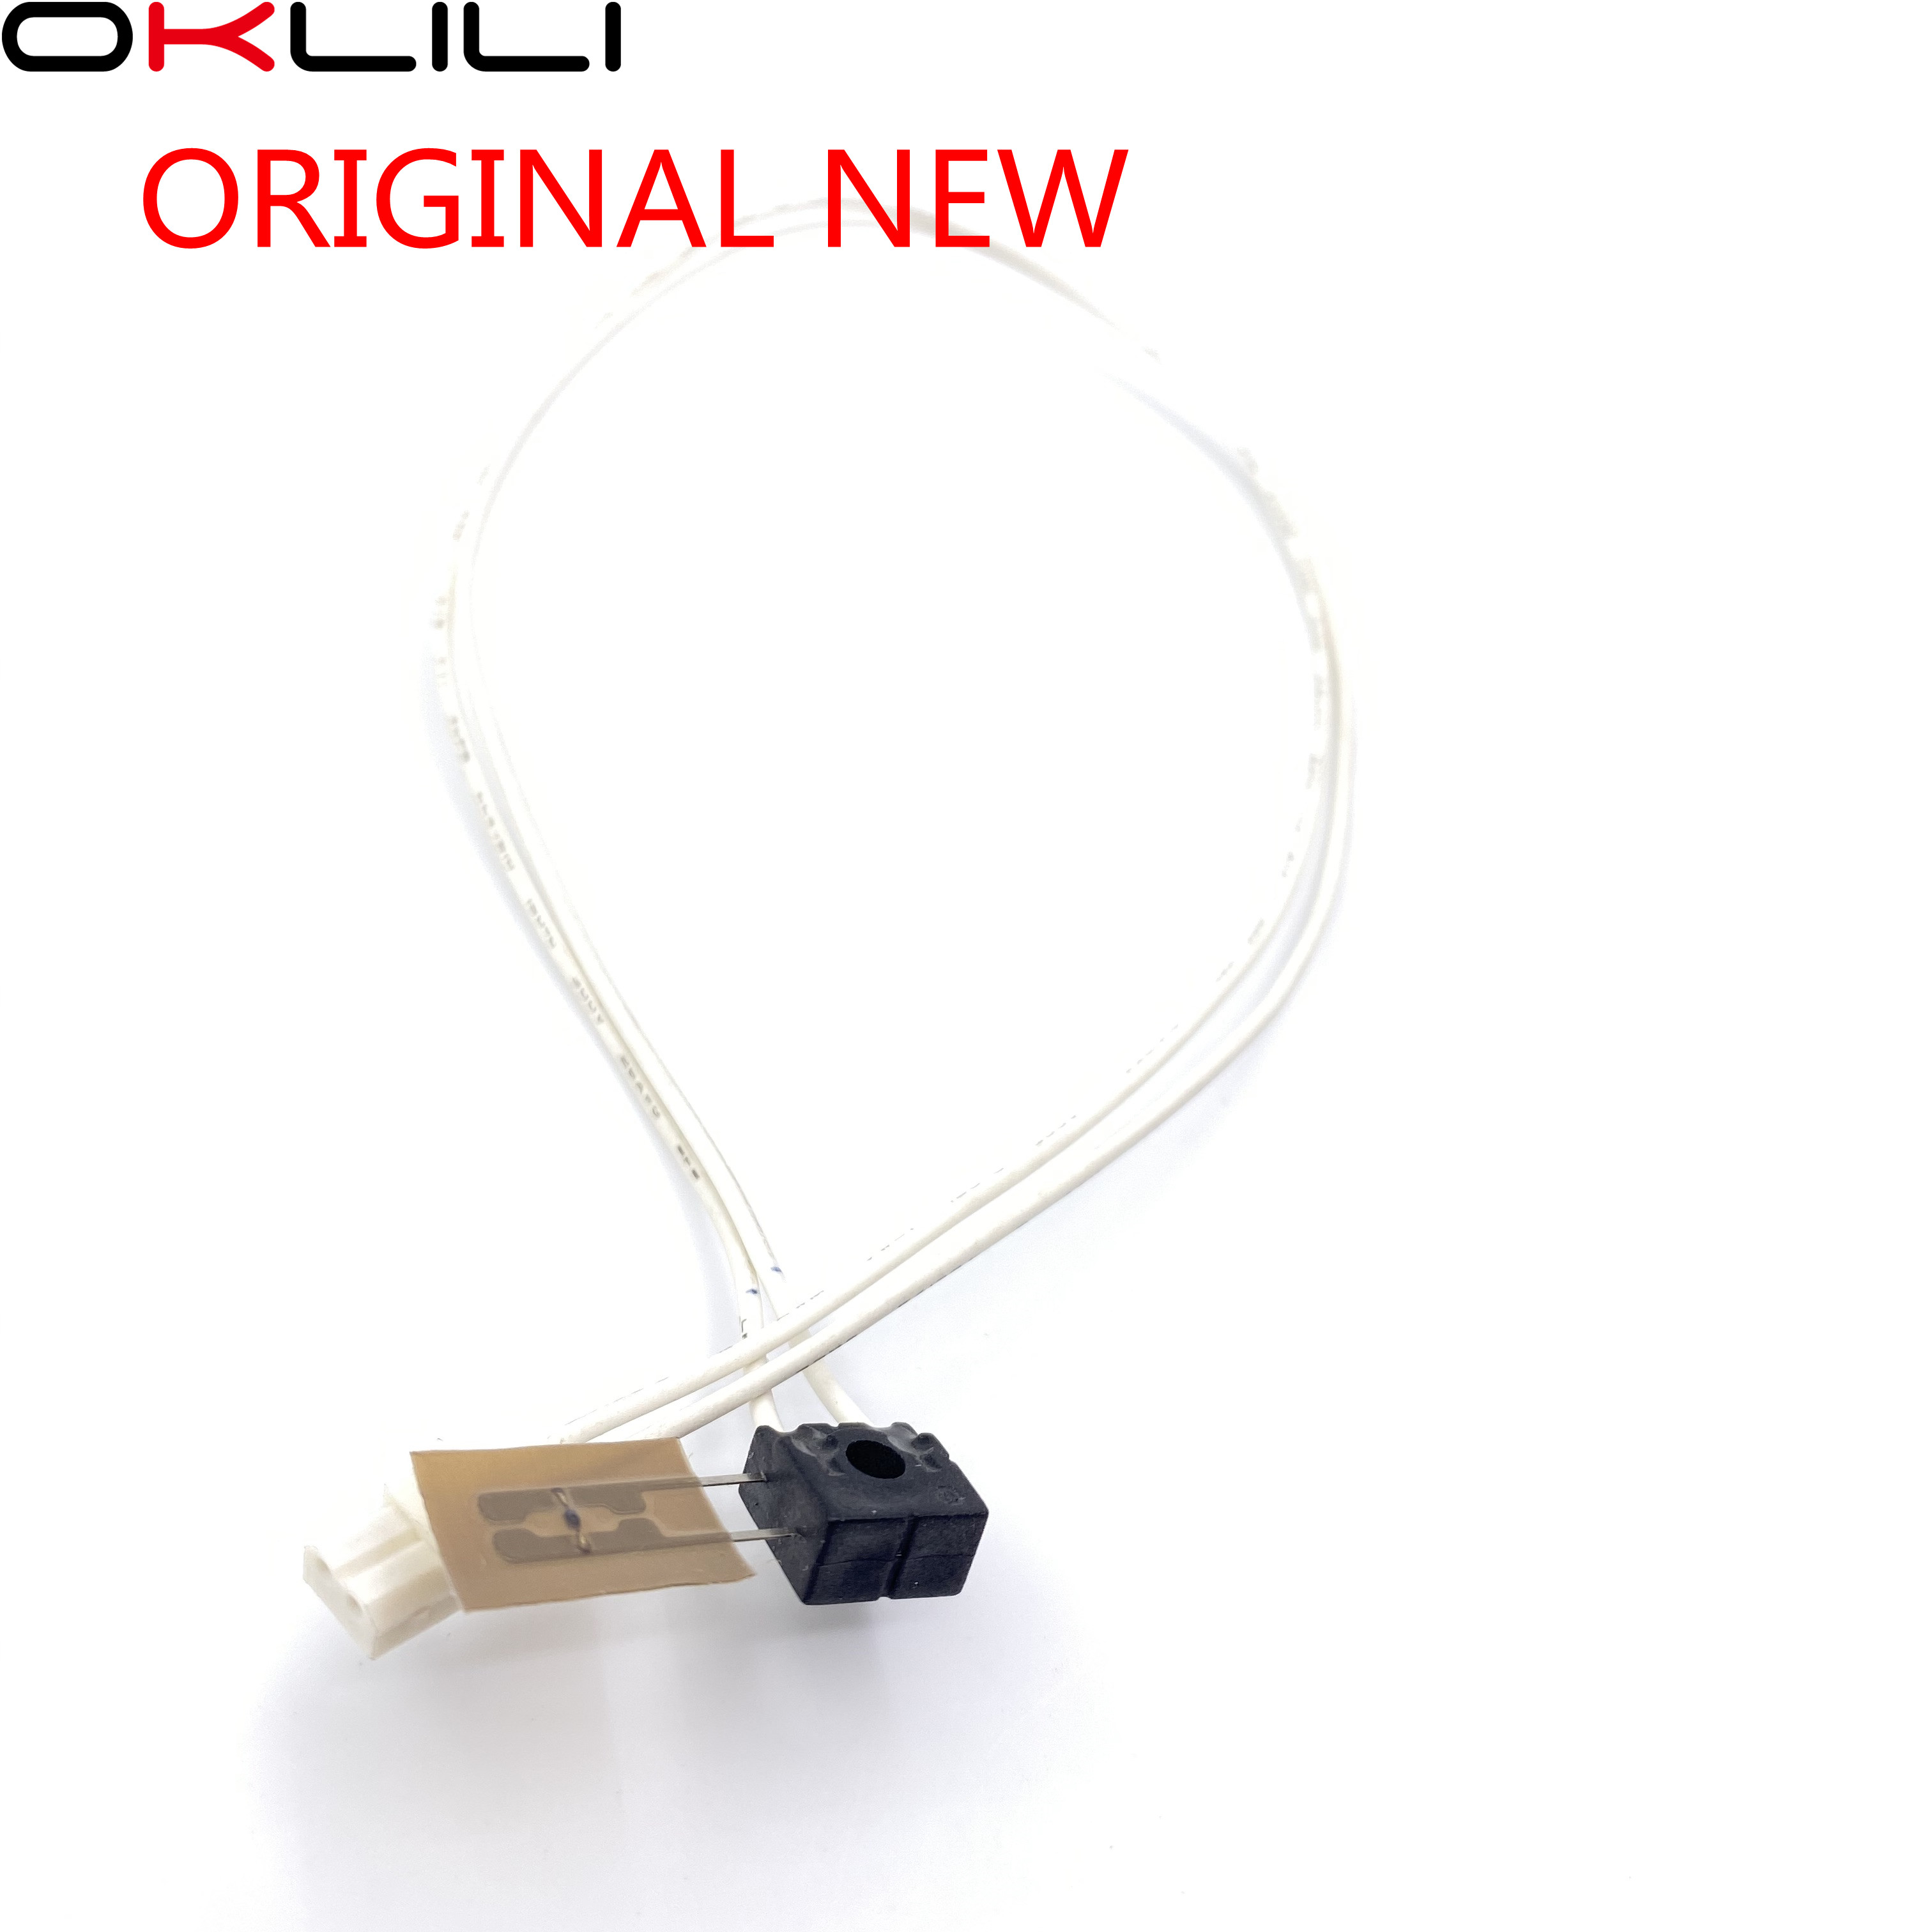 1X 1404-001298 Thermistor For Samsung ML1510 ML1520 ML1610 ML1615 ML1710 ML1740 ML1750 ML2010 ML2015 ML2150 ML2250 ML2251 ML2252